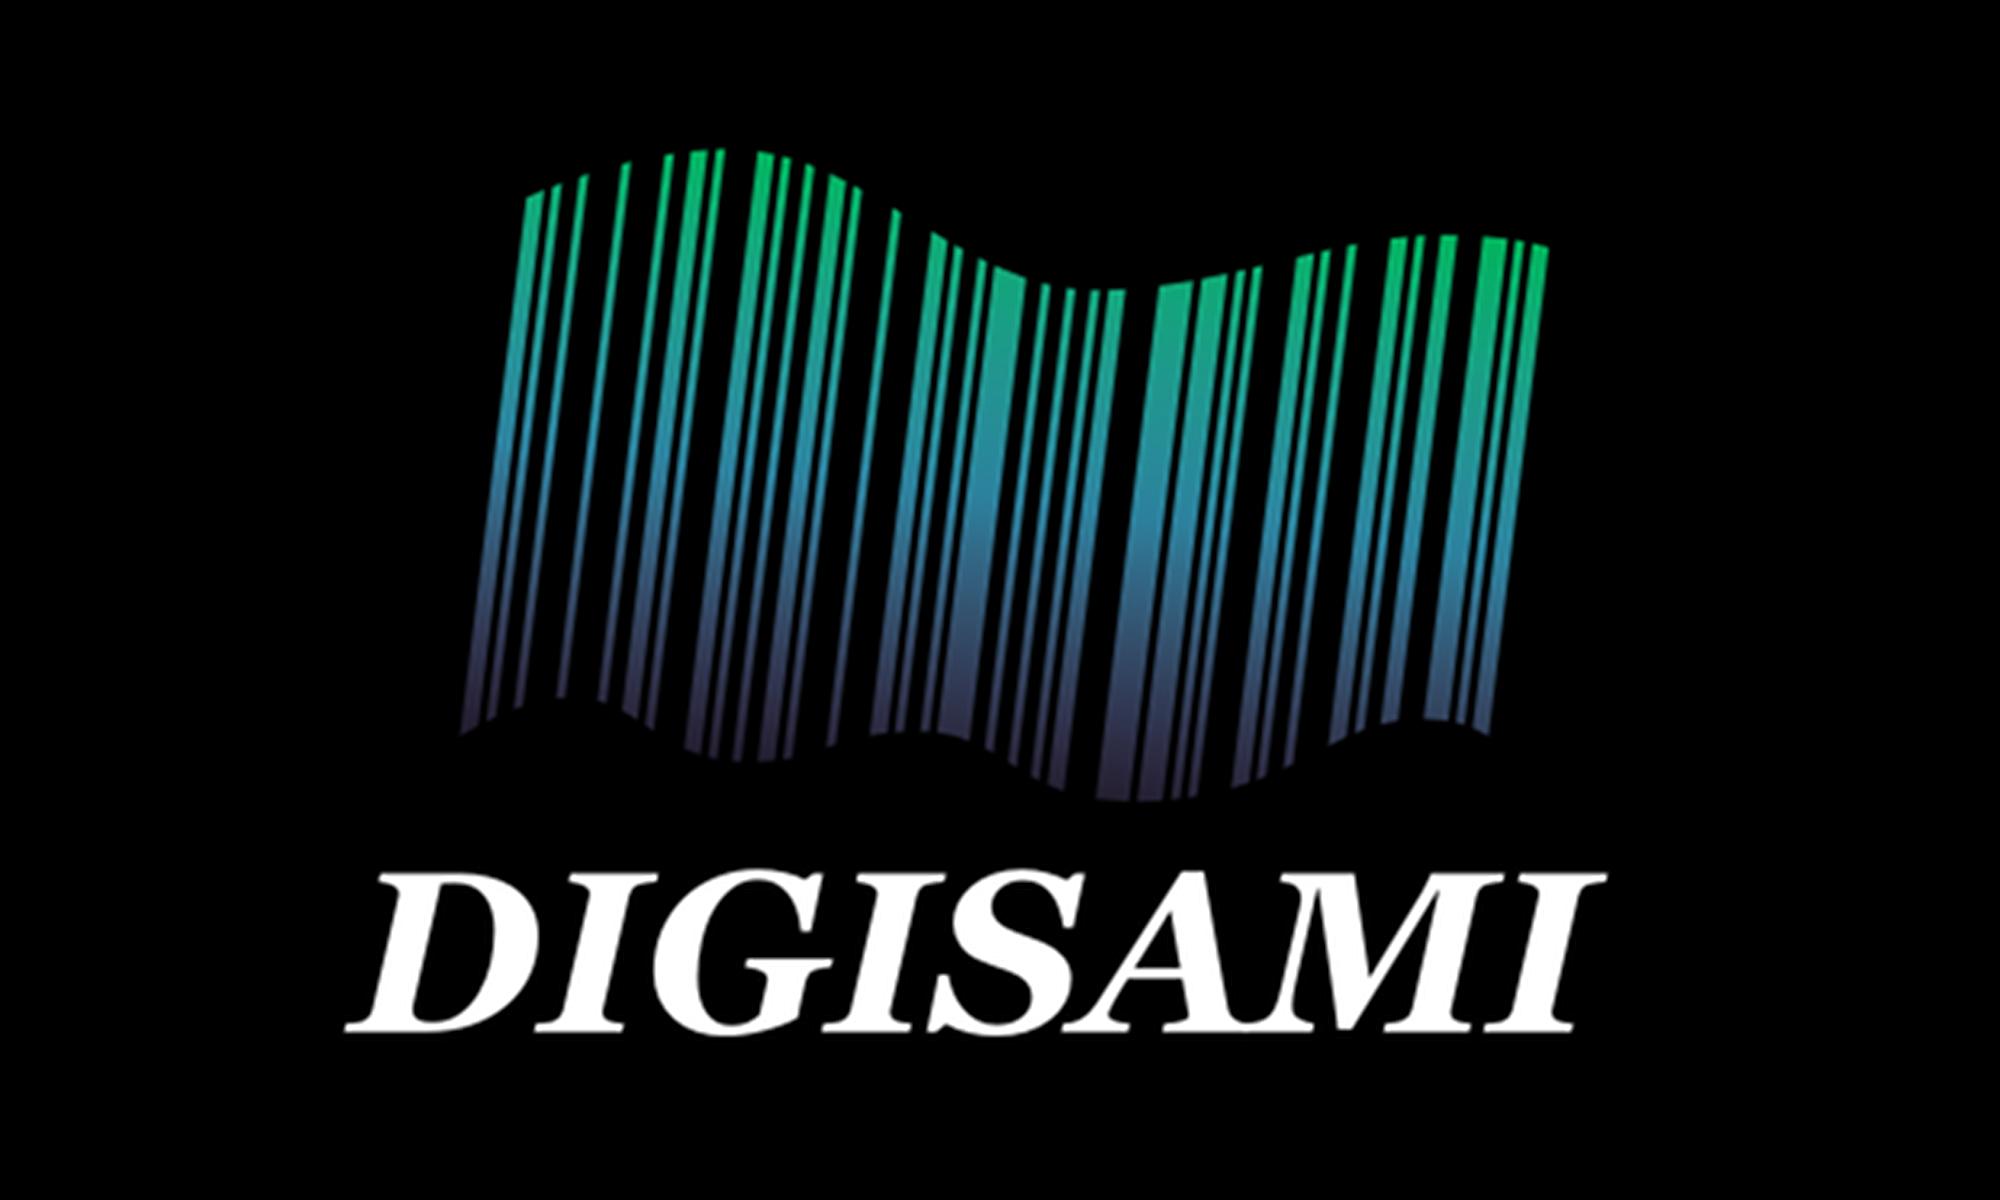 DigiSami logo